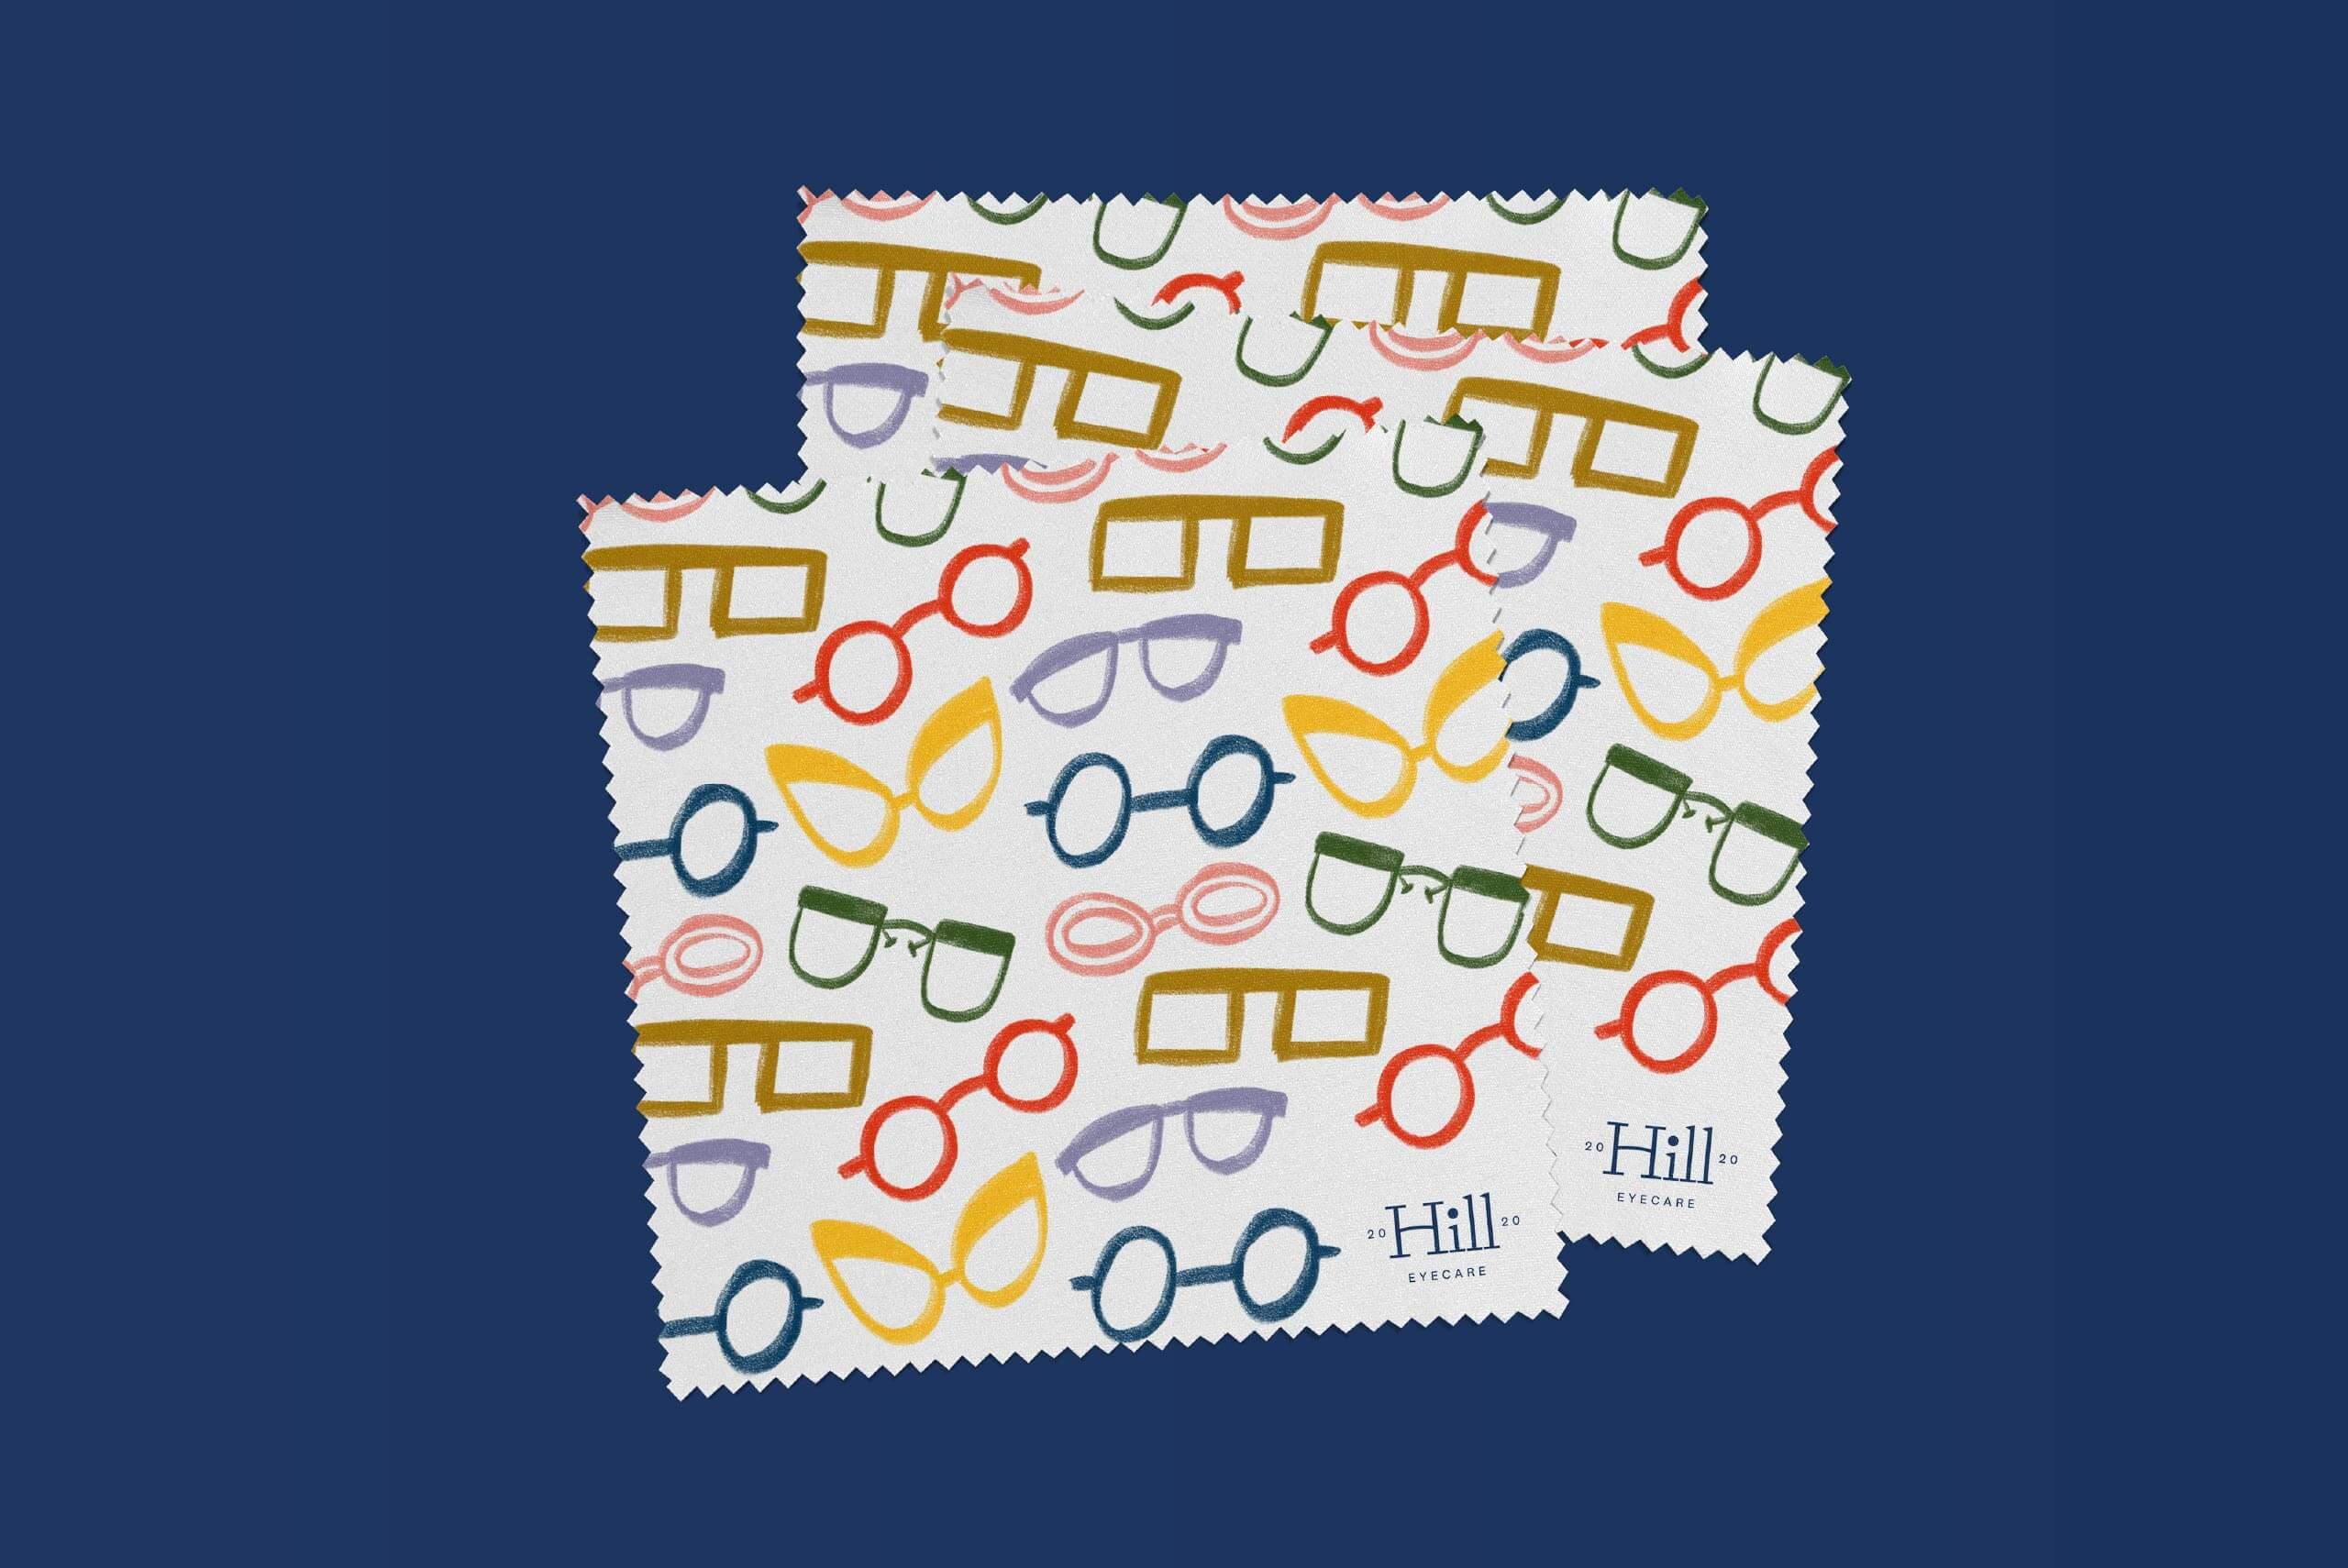 FRH-Hill-Eyecare1-copy-13